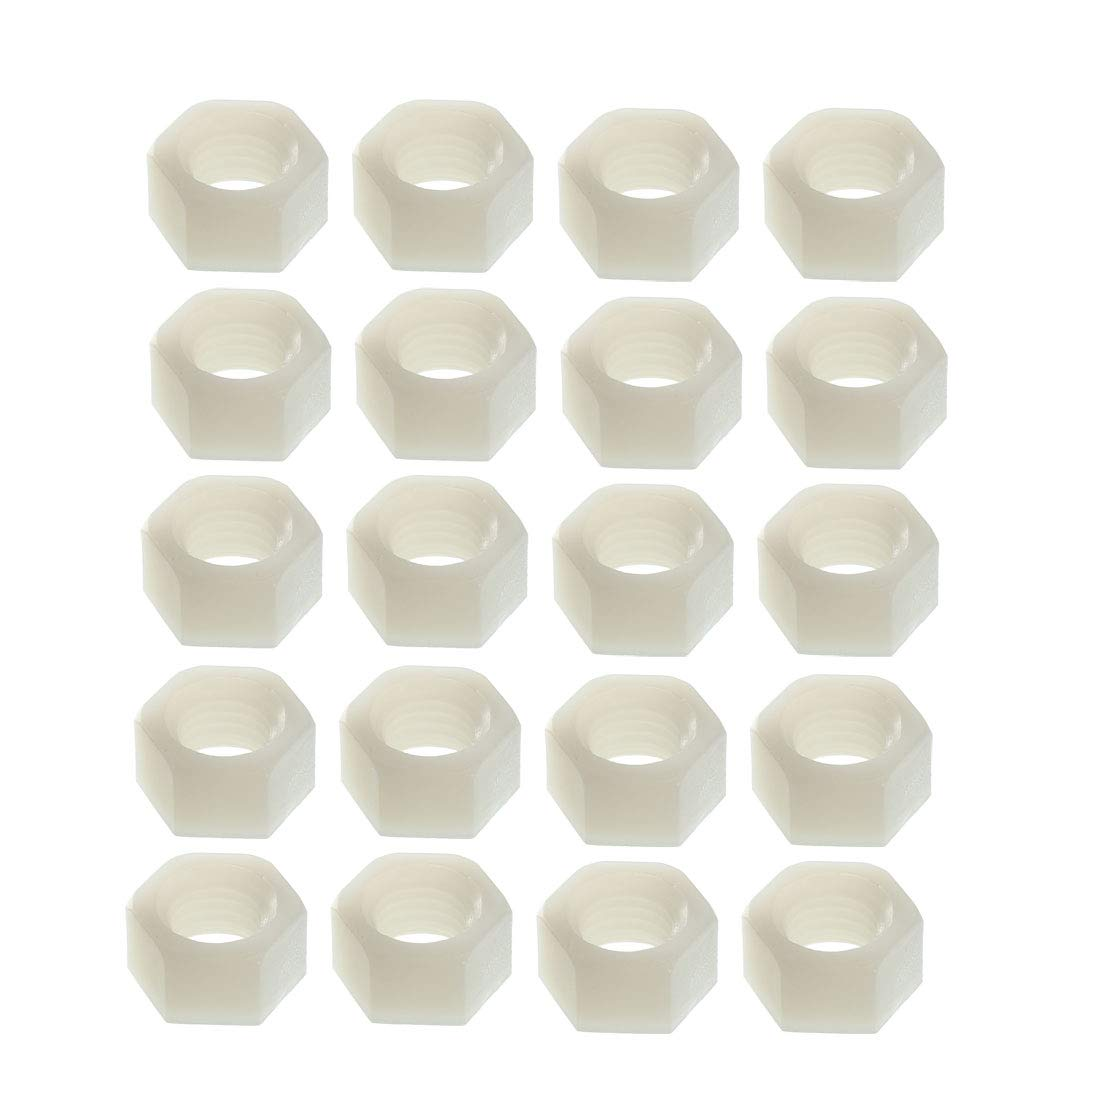 uxcell Nylon Hex Nut White M2x0.4mm Metric Coarse Thread Hexagon Nuts 10 Pcs